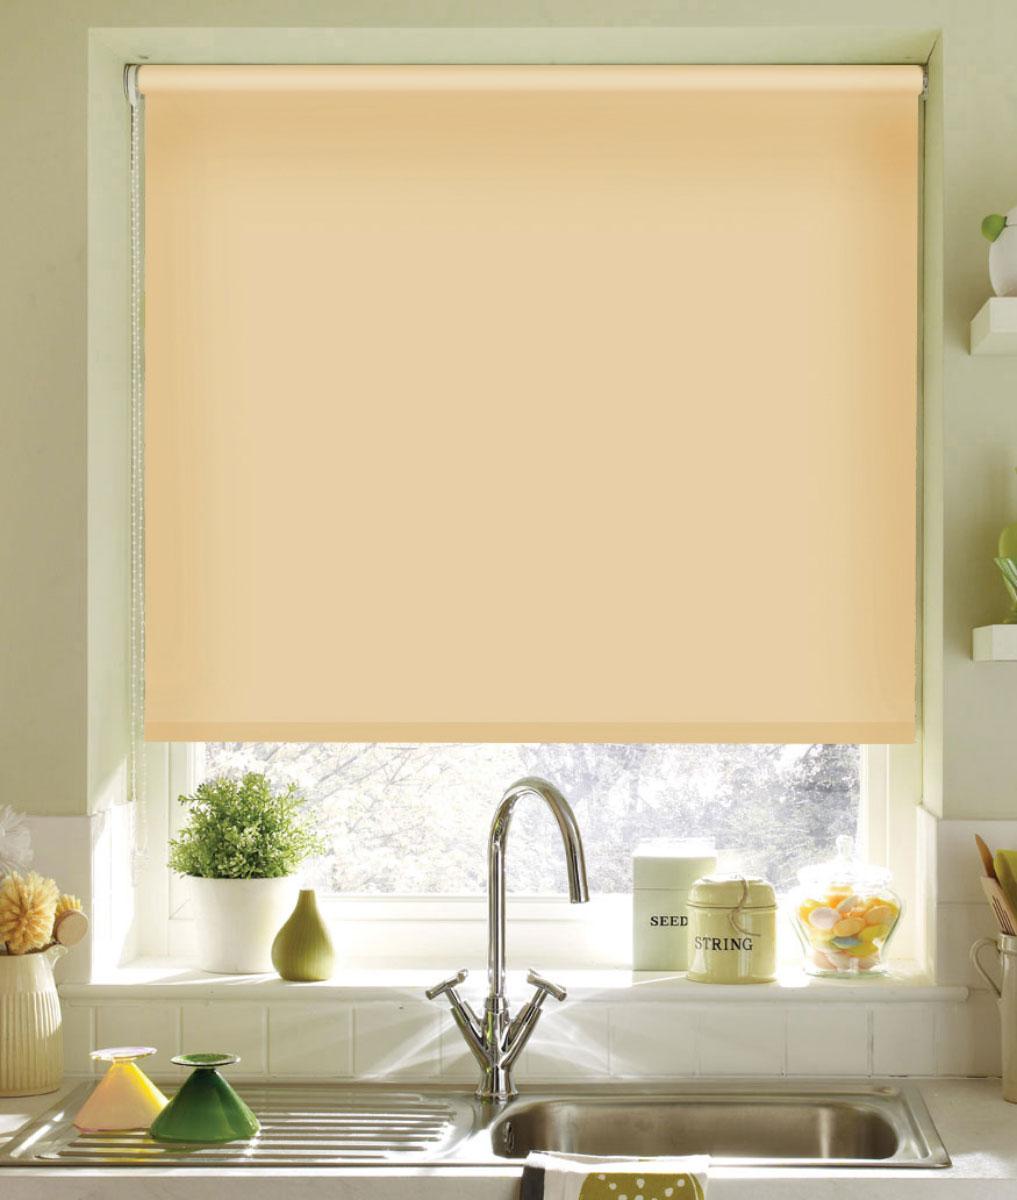 Миниролло KauffOrt 83х170 см, цвет: светлый абрикос